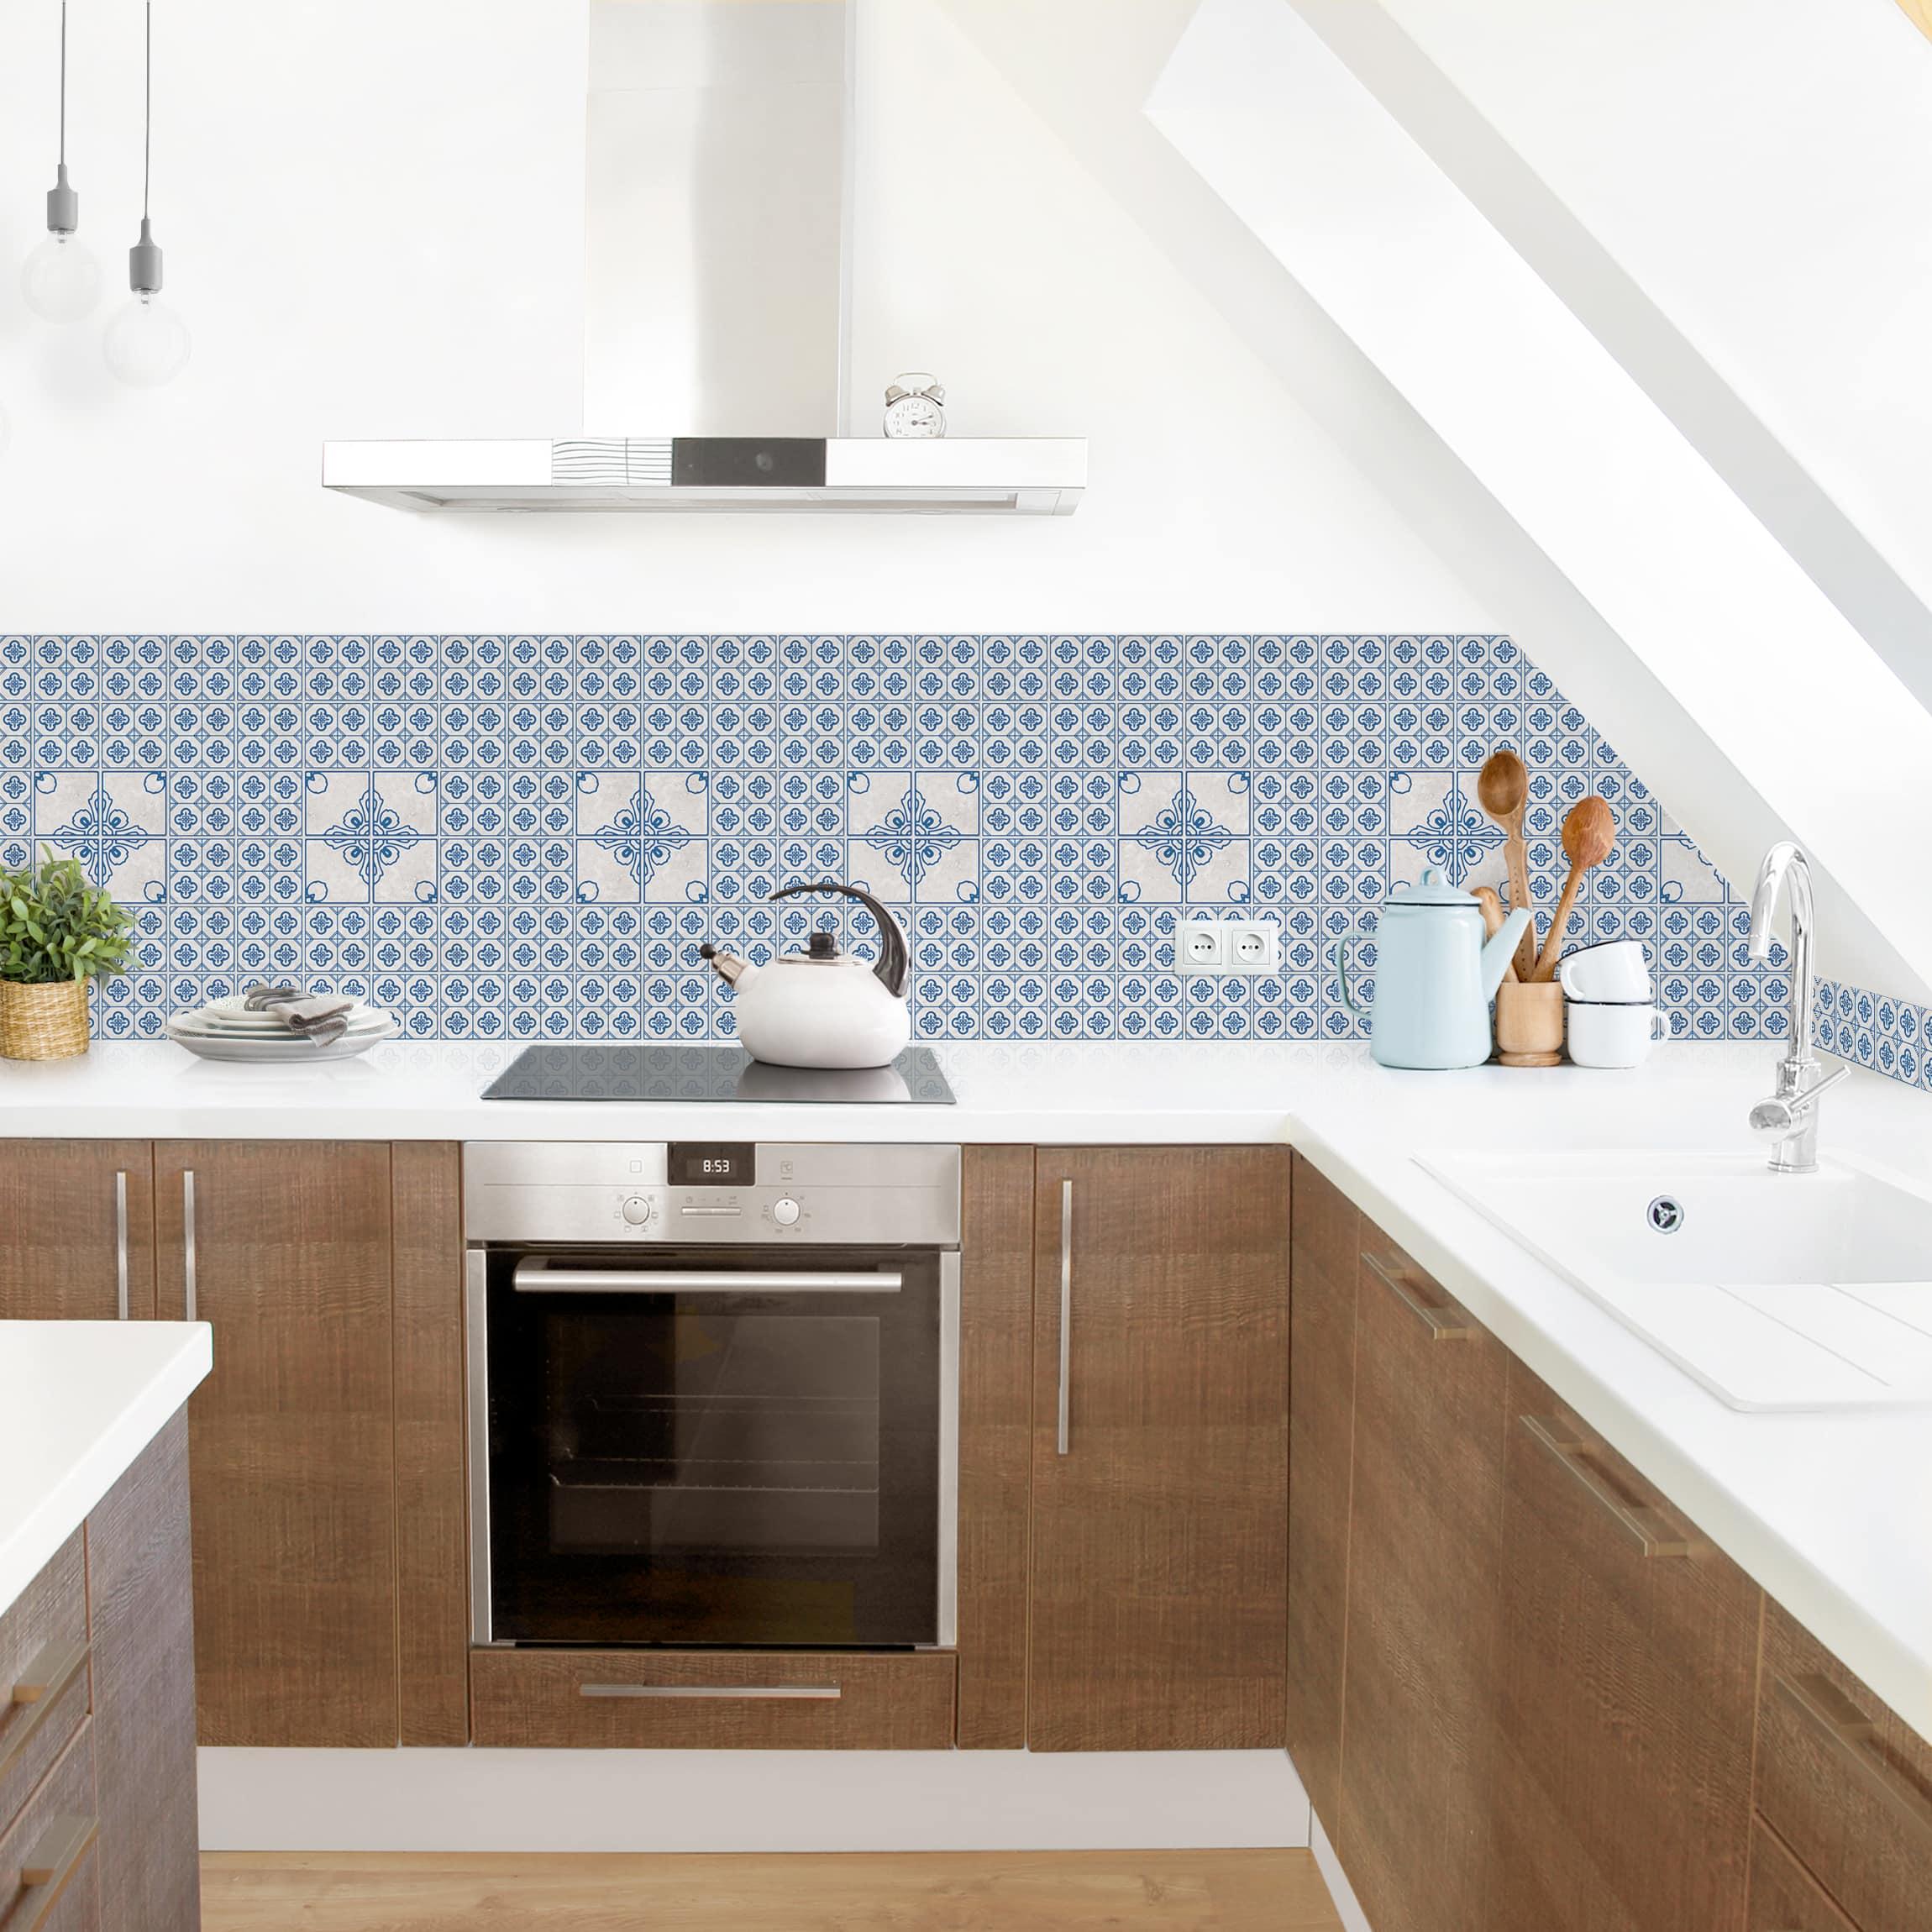 Piastrelle Cucina Da Incollare rivestimento cucina - motivo piastrelle porto blu